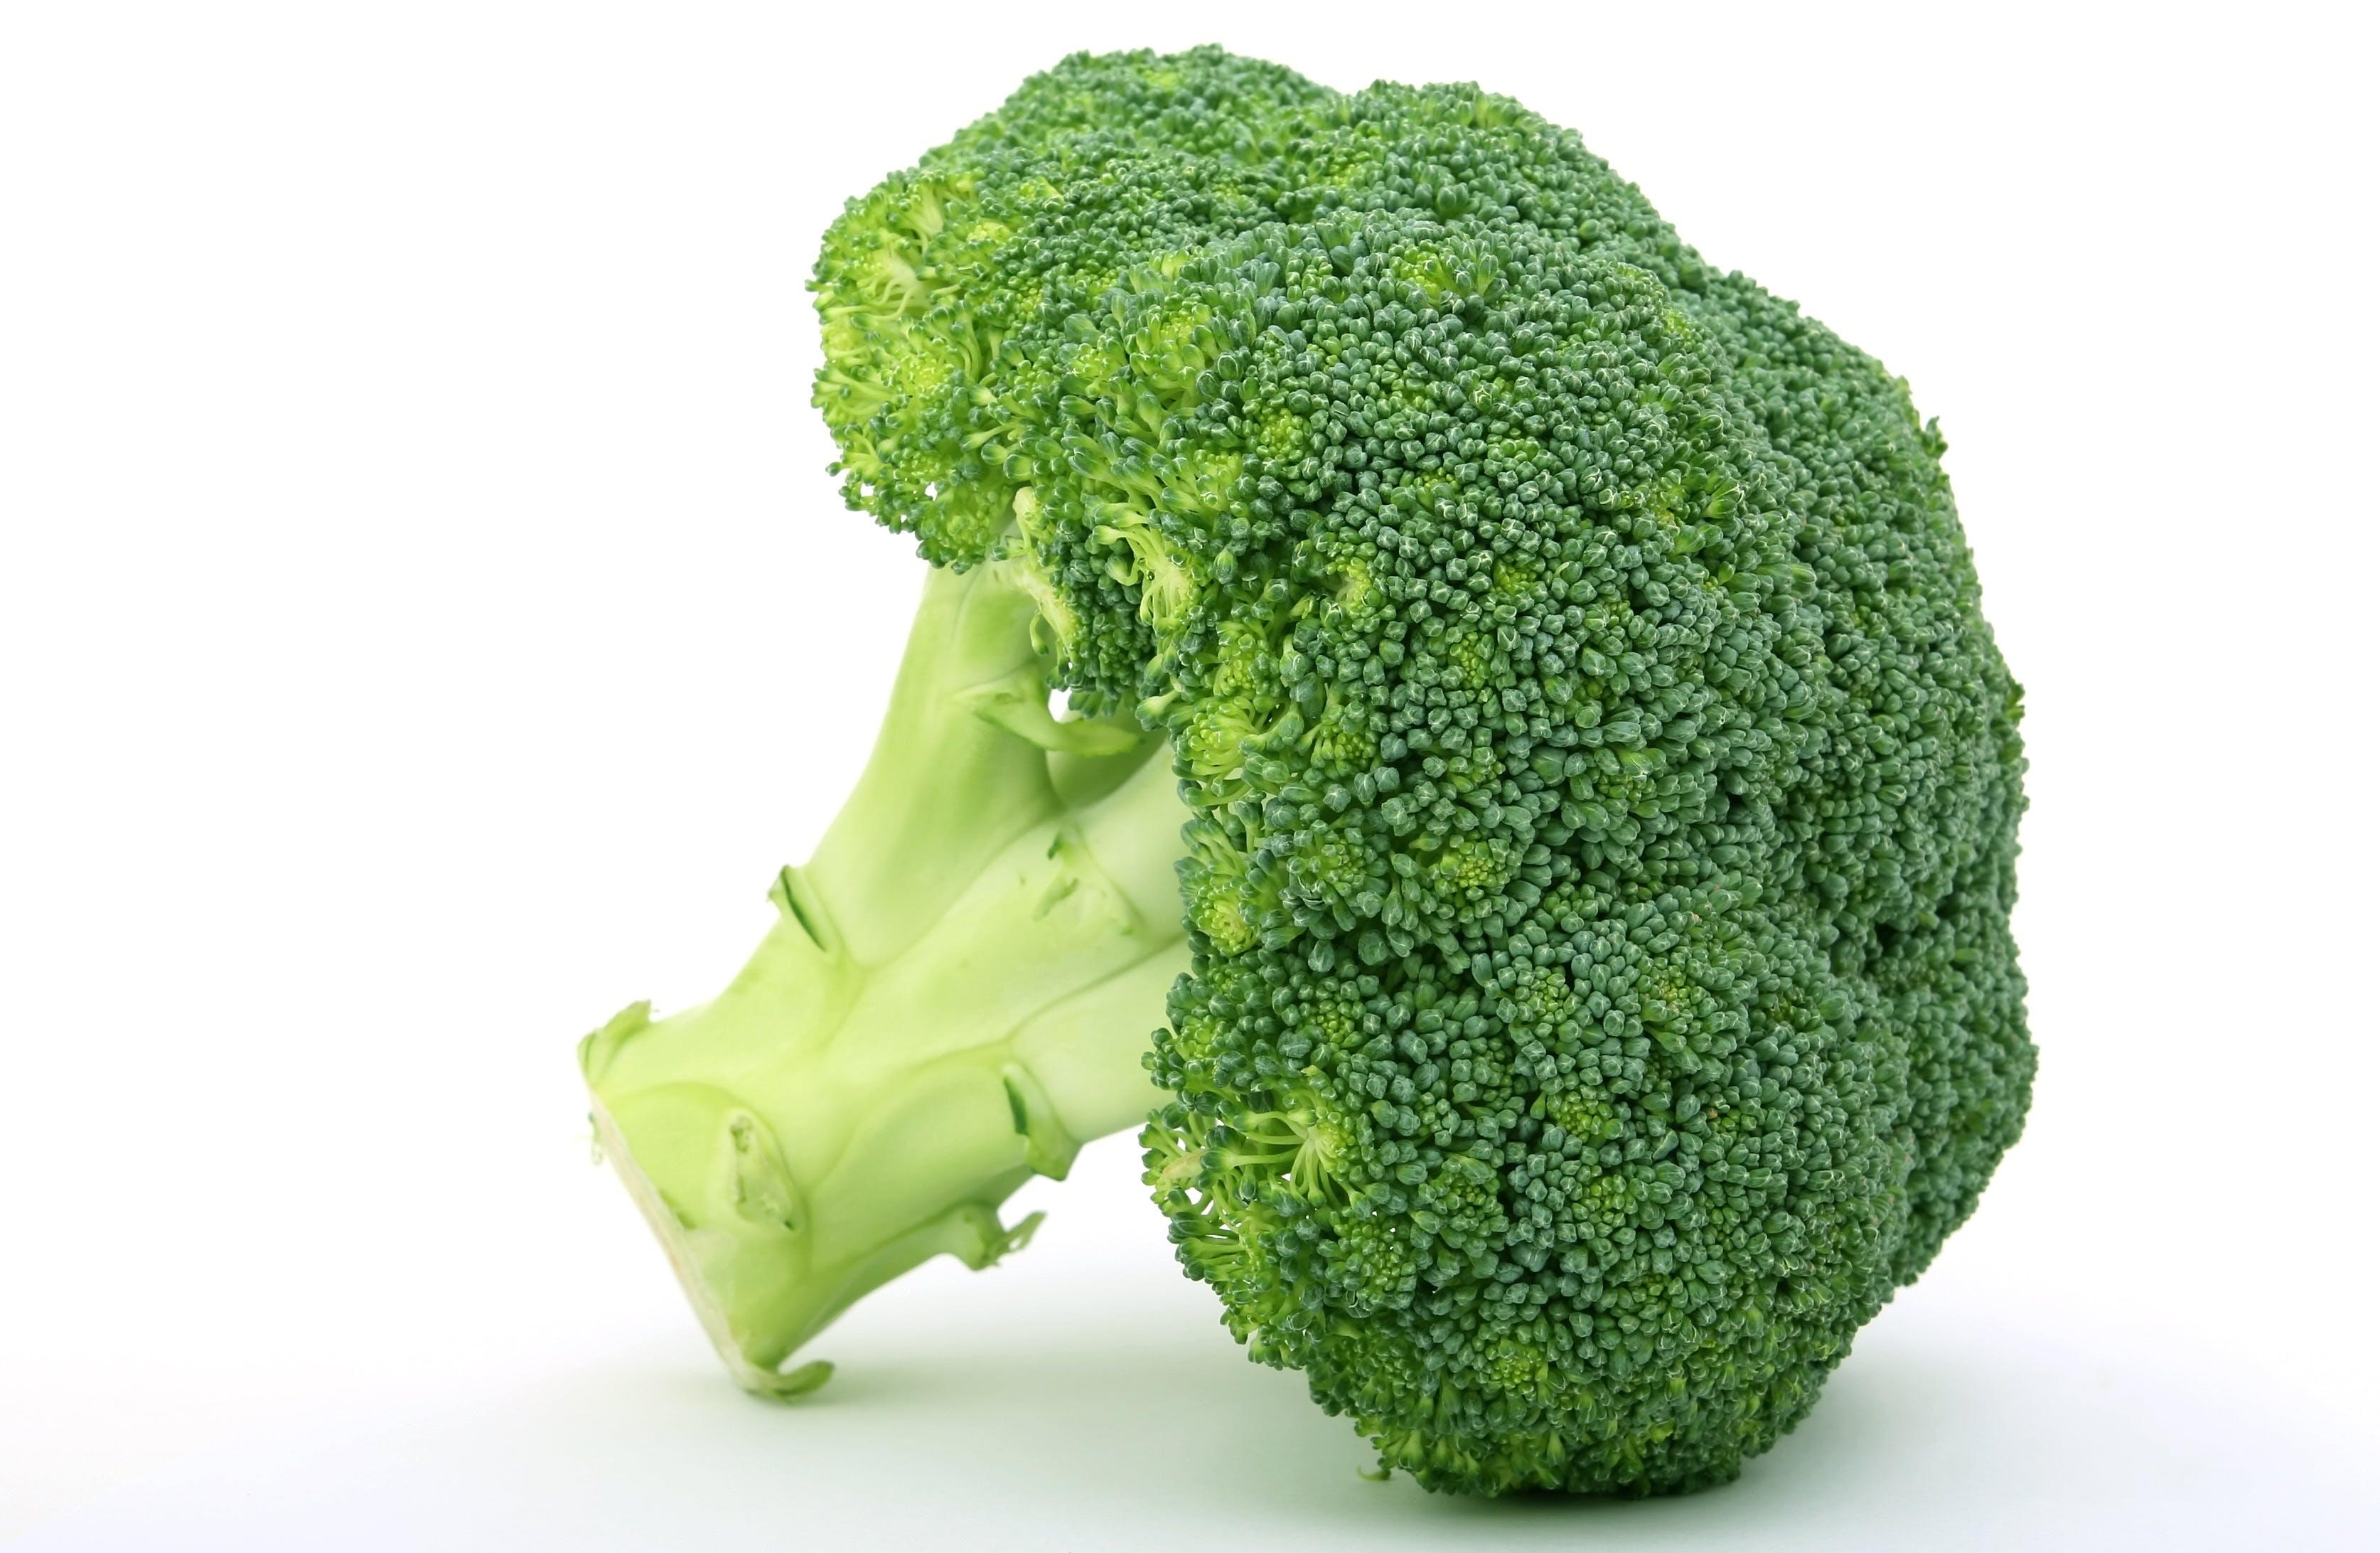 Free stock photo of appetite, broccoli, brocoli broccolli, calories